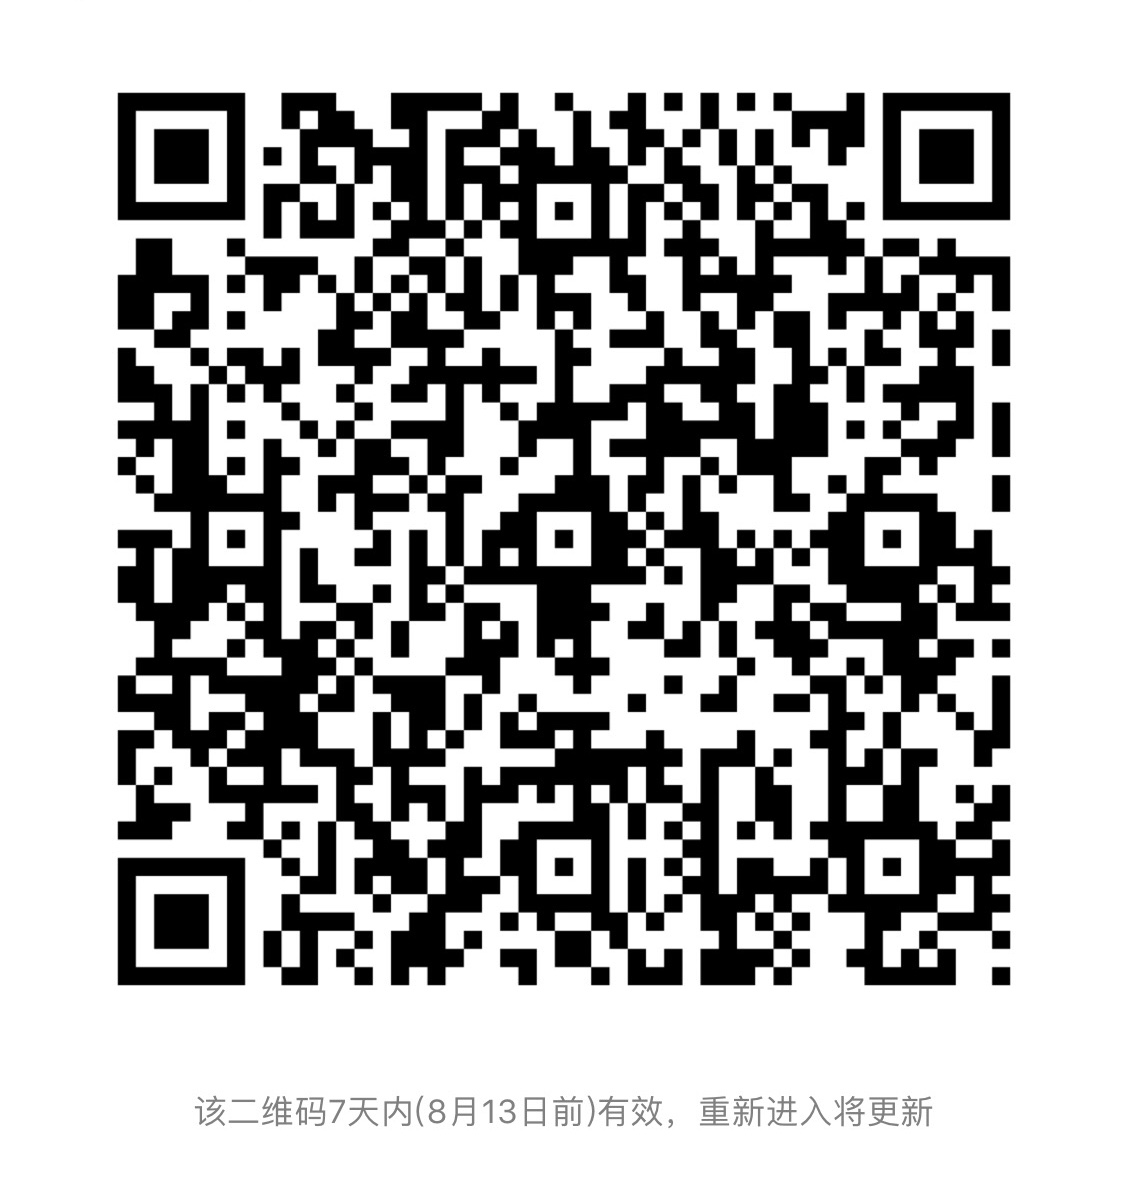 018A66F5-D4A3-401C-951B-C2C621035BFB.jpeg